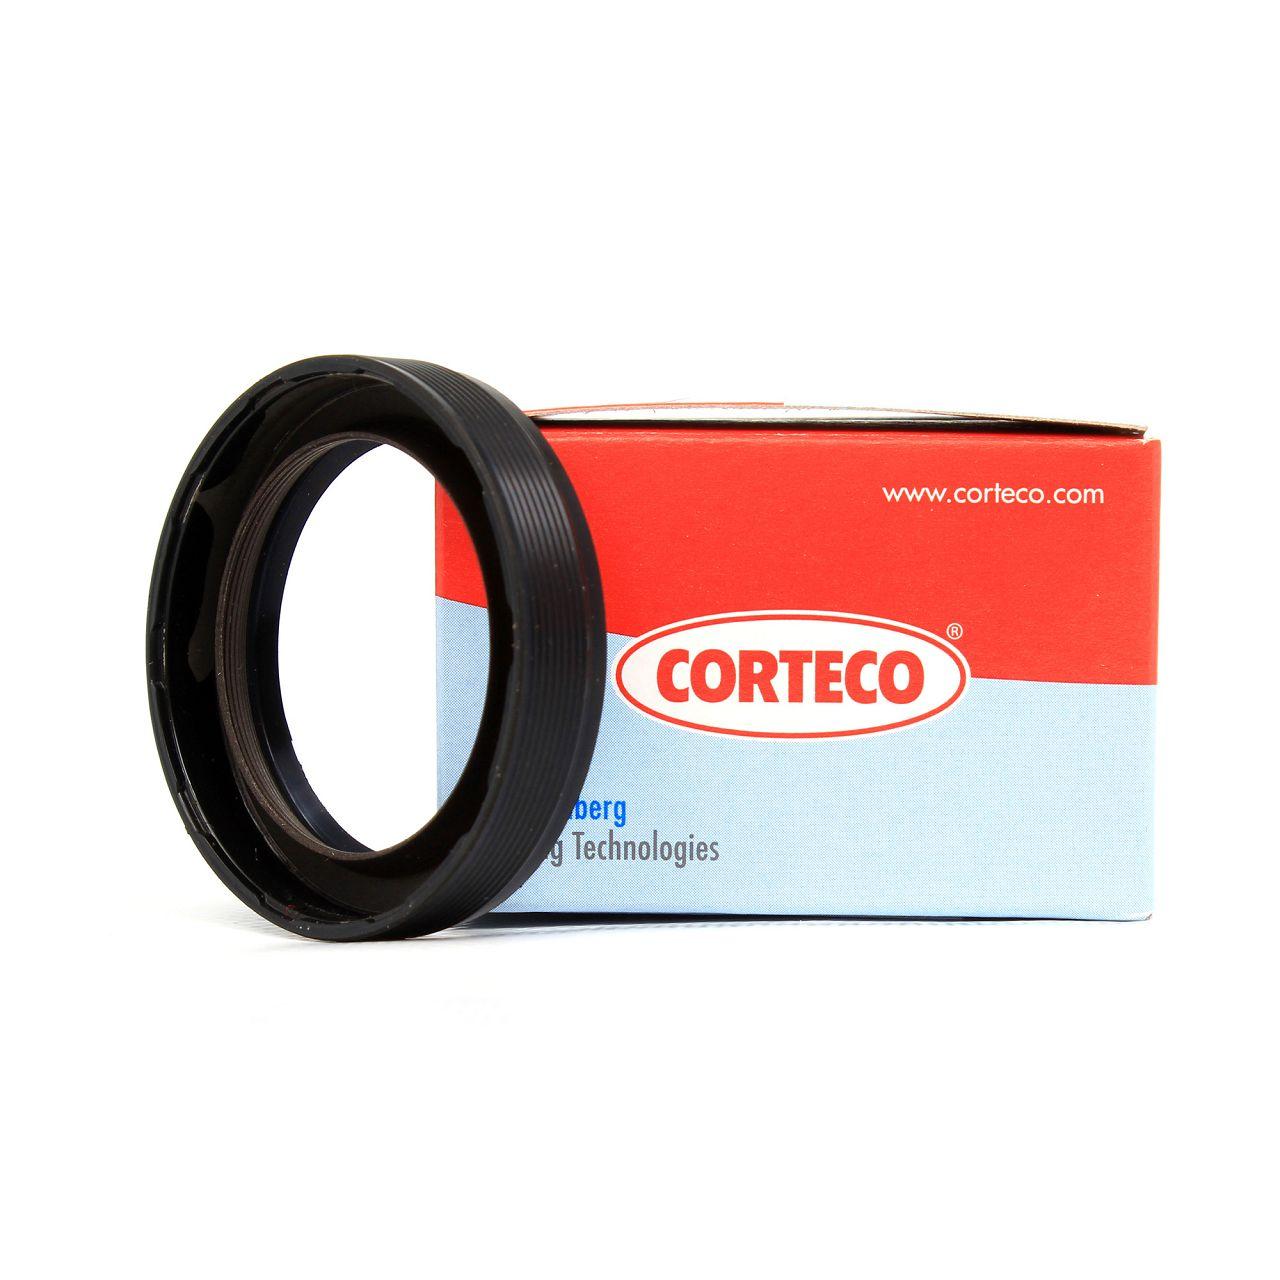 CORTECO Wellendichtring Simmering Kurbelwelle 35x48x10mm stirnseitig 20026412B